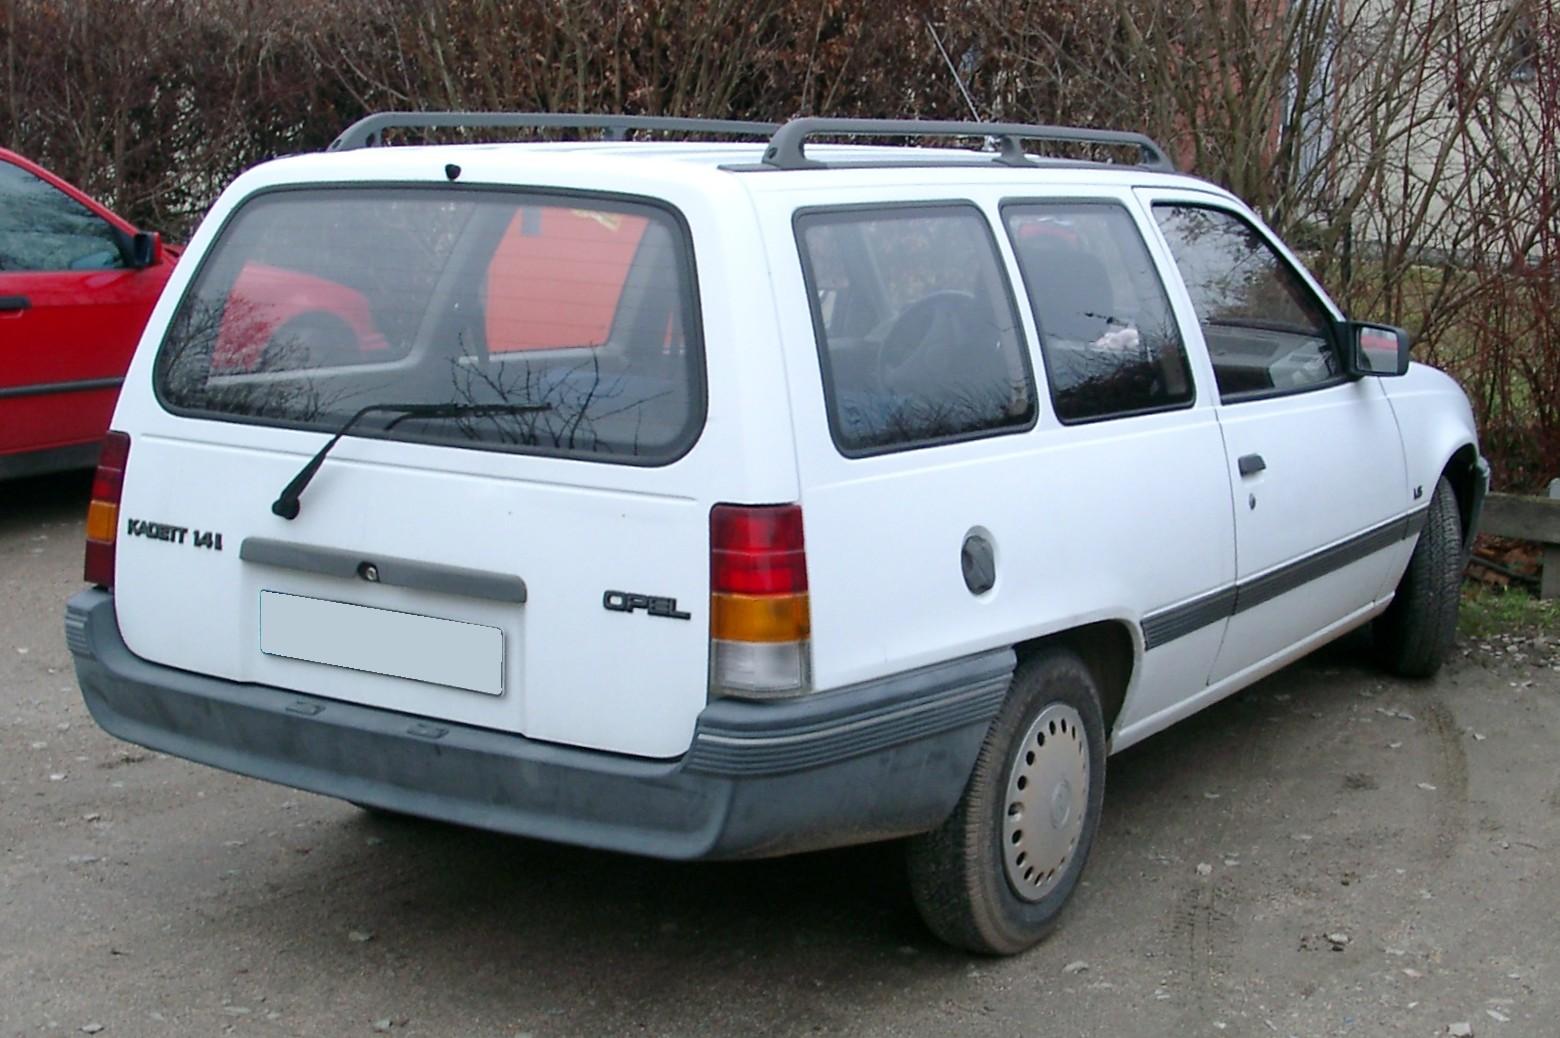 Vauxhall Astra E 1984 - 1991 Station wagon 5 door #1